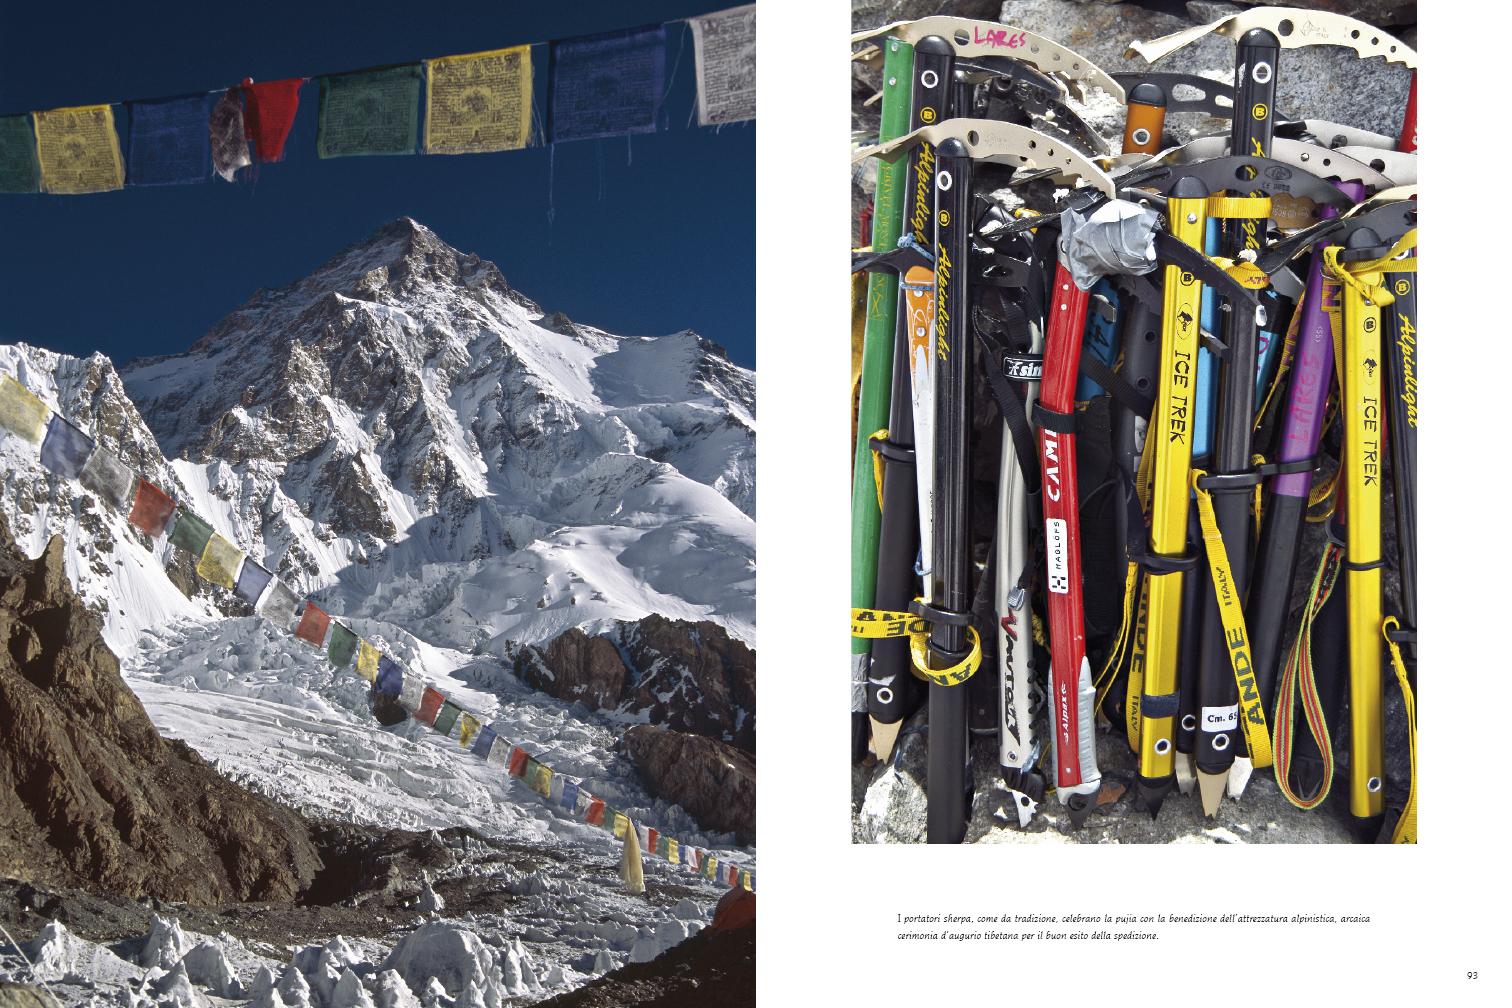 K2 EXPEDITION 1954-2004 Giuseppe Ghedina Fotografo - 048.jpg